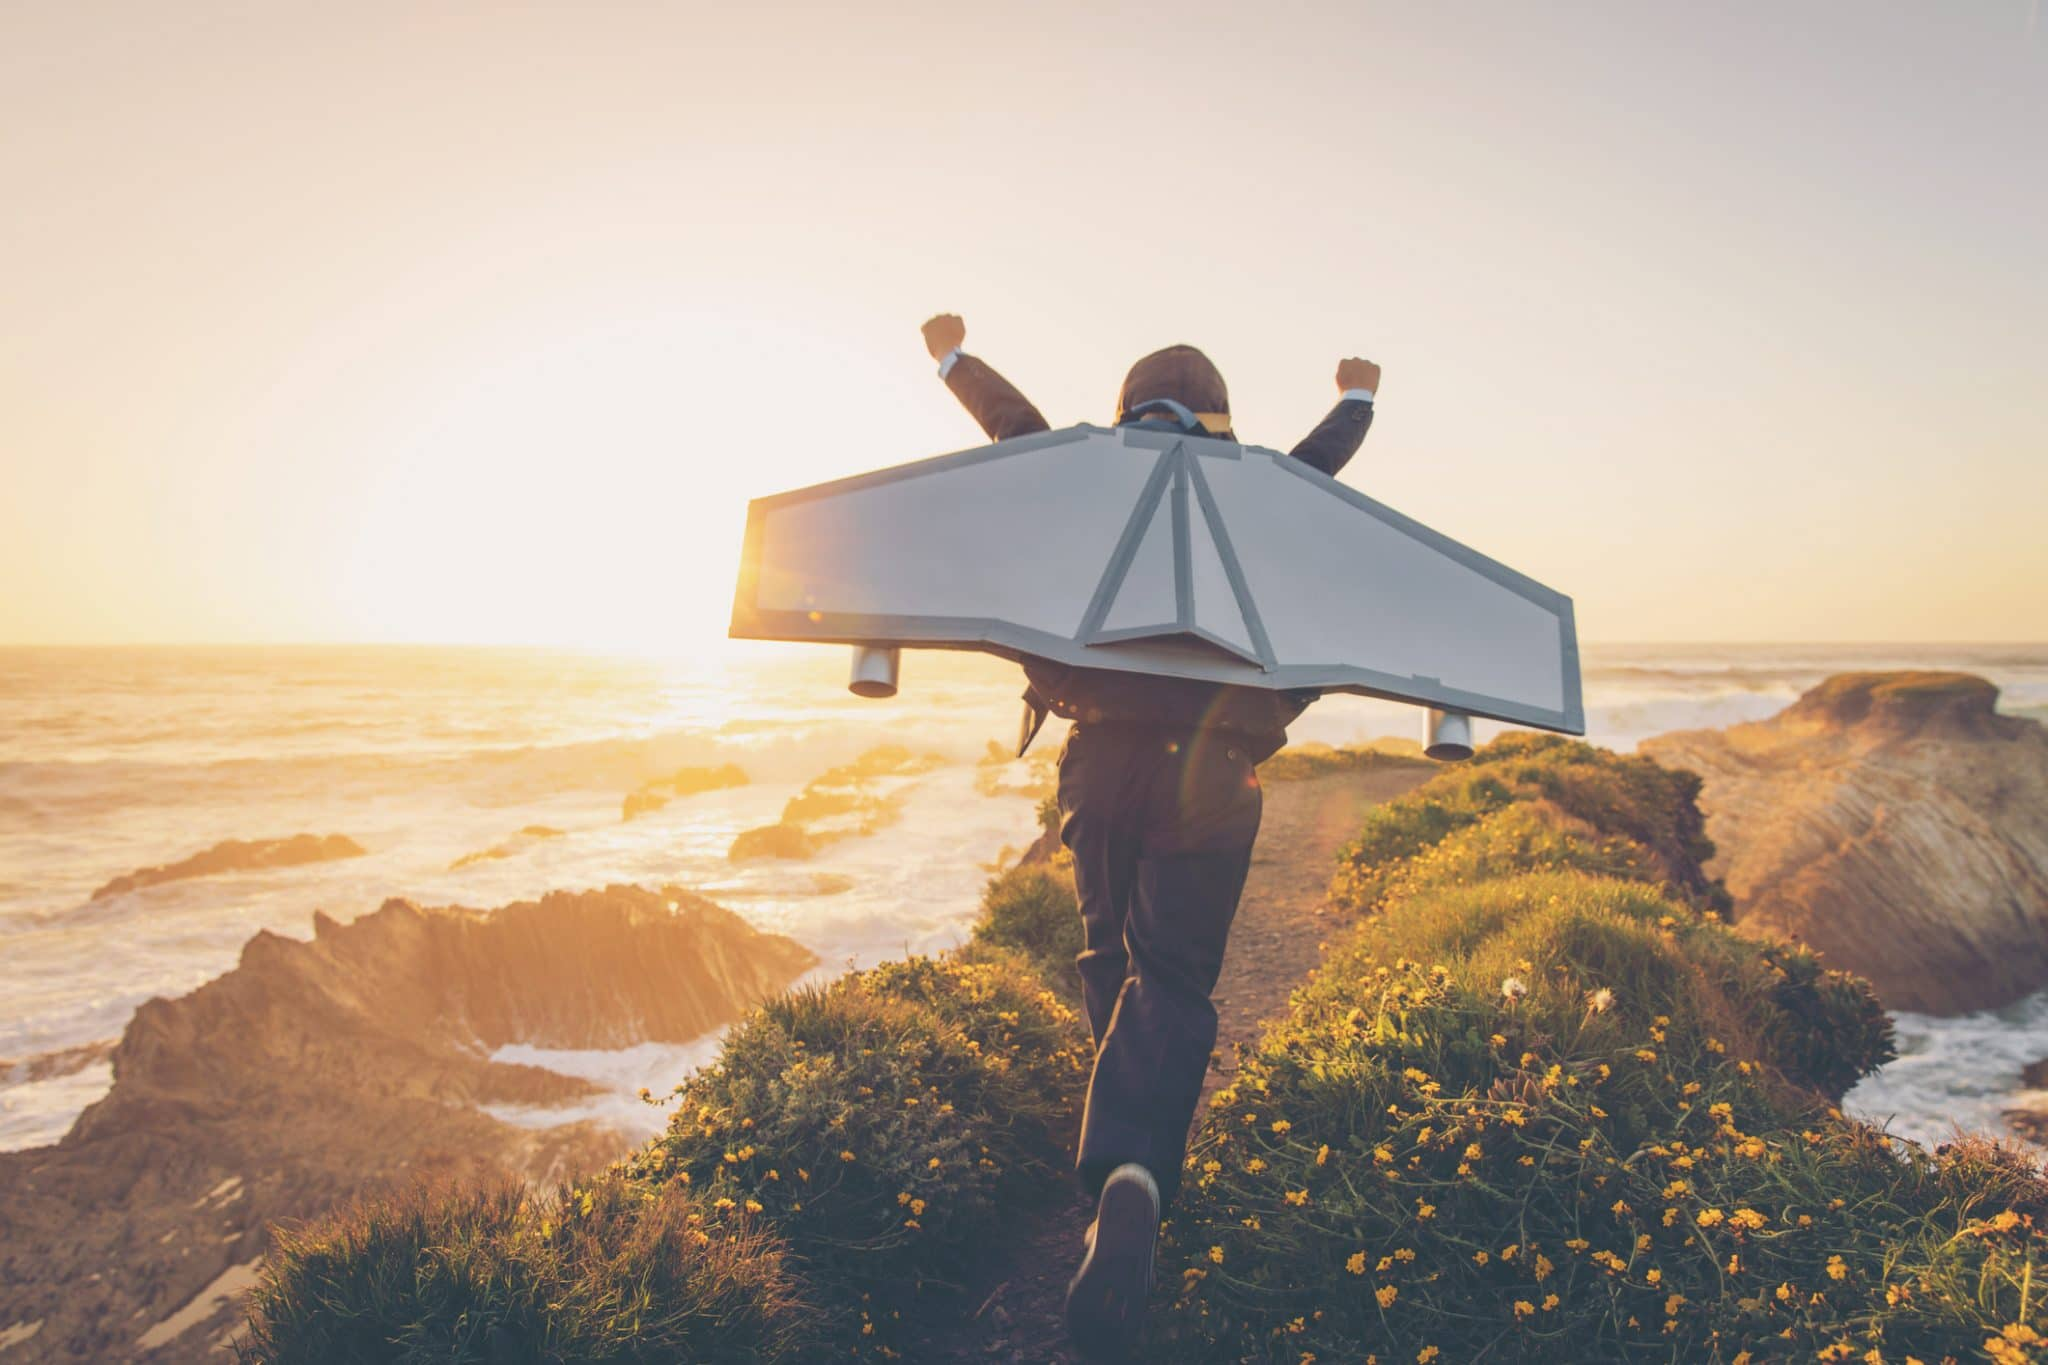 Acomplishment resume writing tips | honors, awards and accomplishments